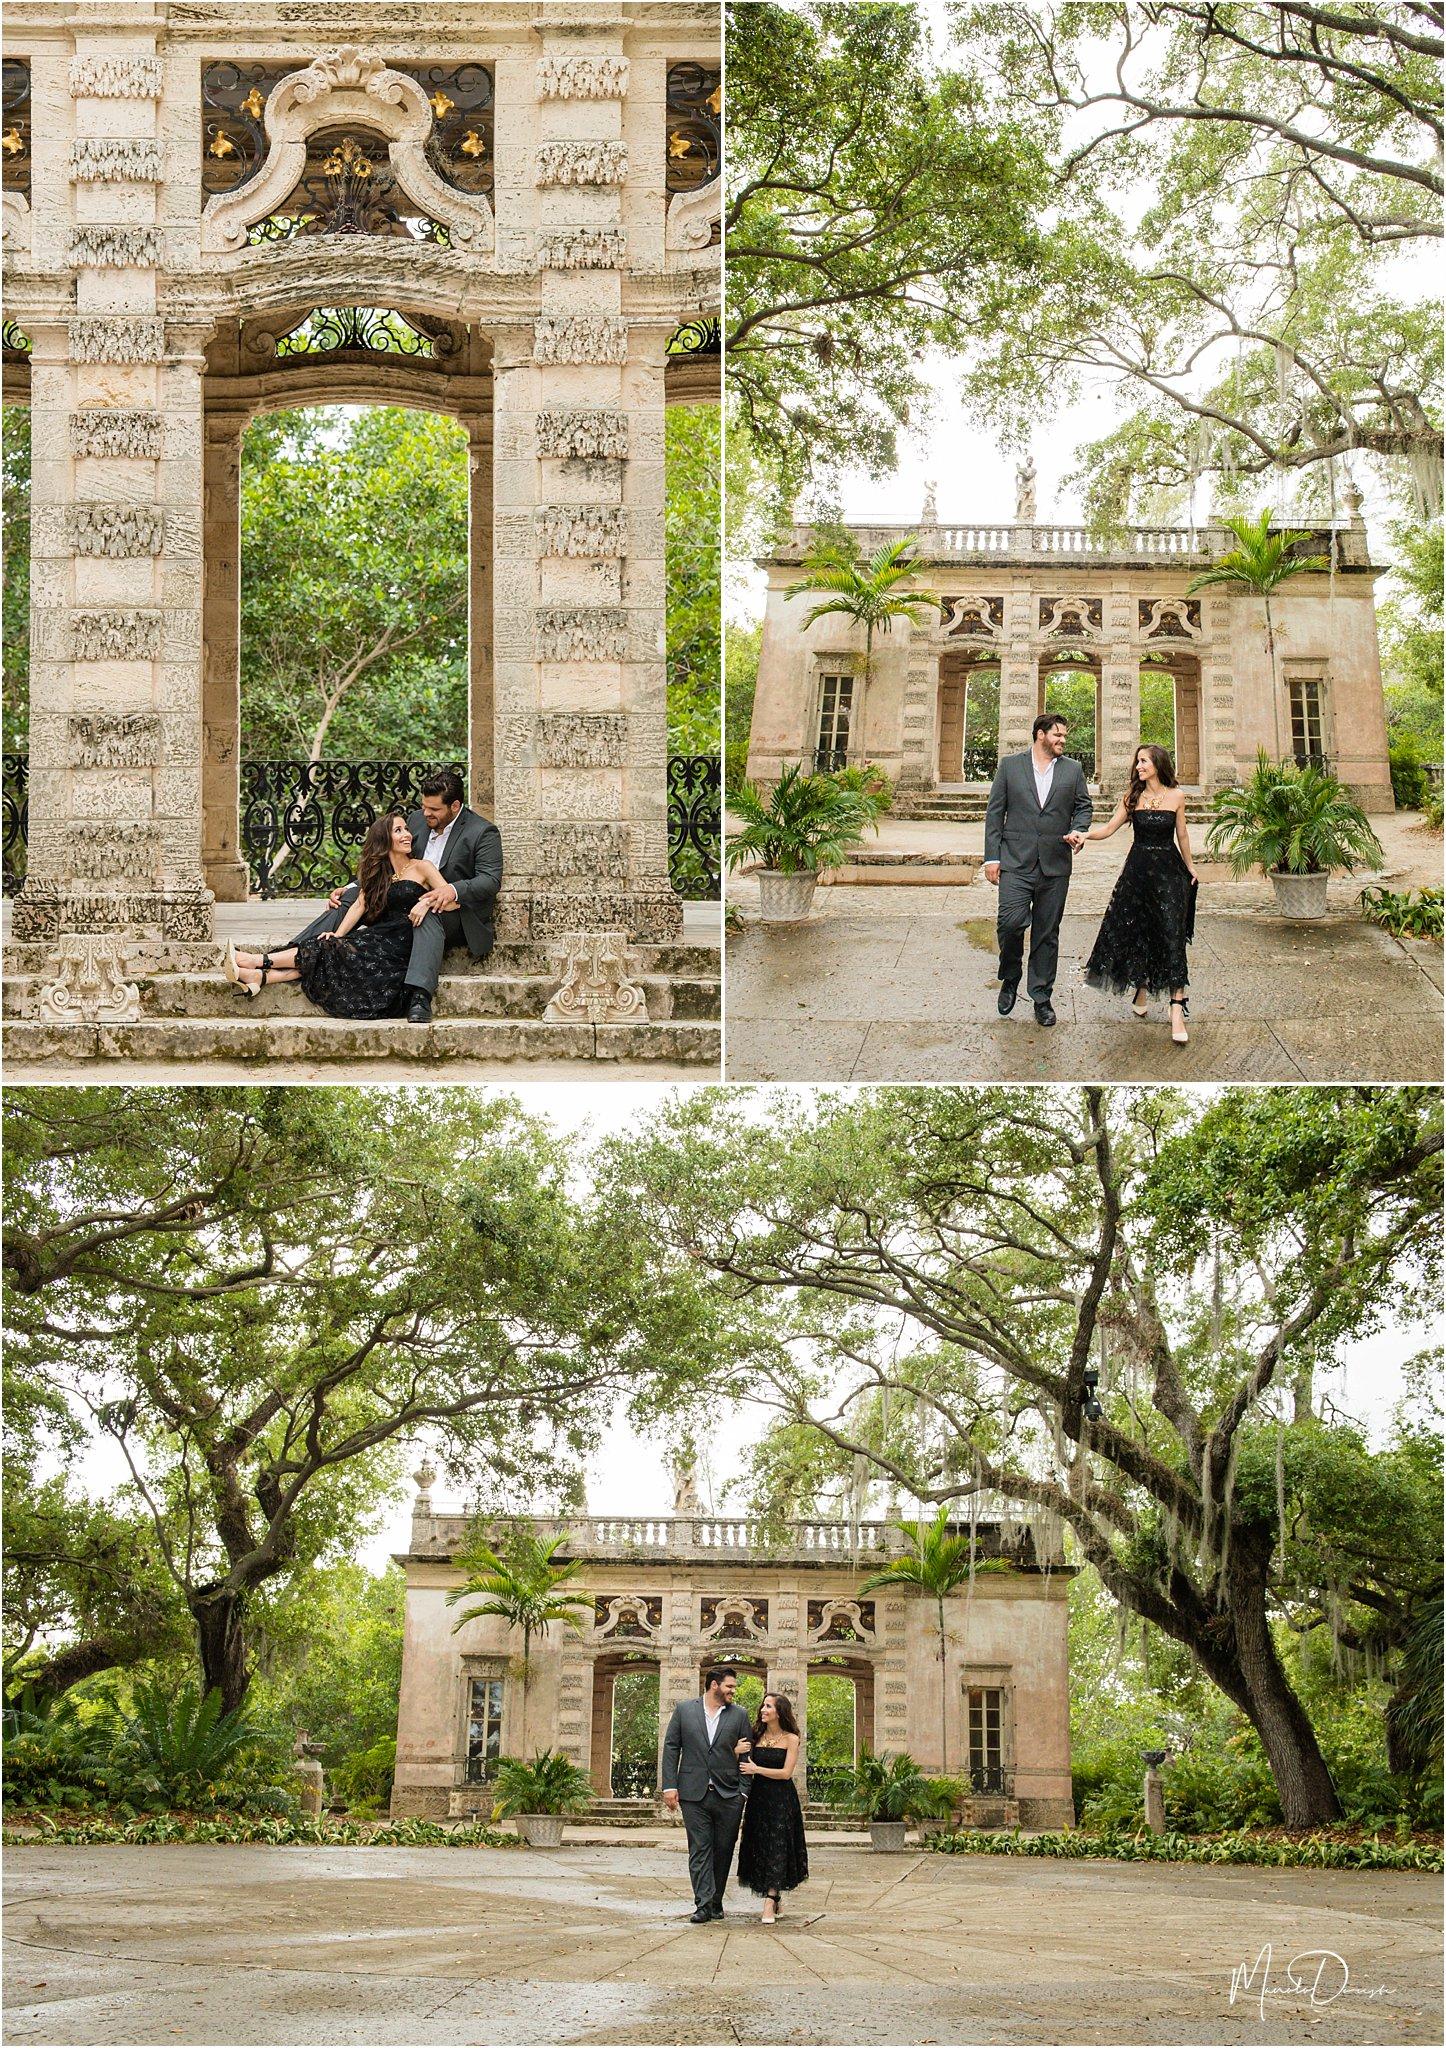 0592_ManoloDoreste_InFocusStudios_Wedding_Family_Photography_Miami_MiamiPhotographer.jpg